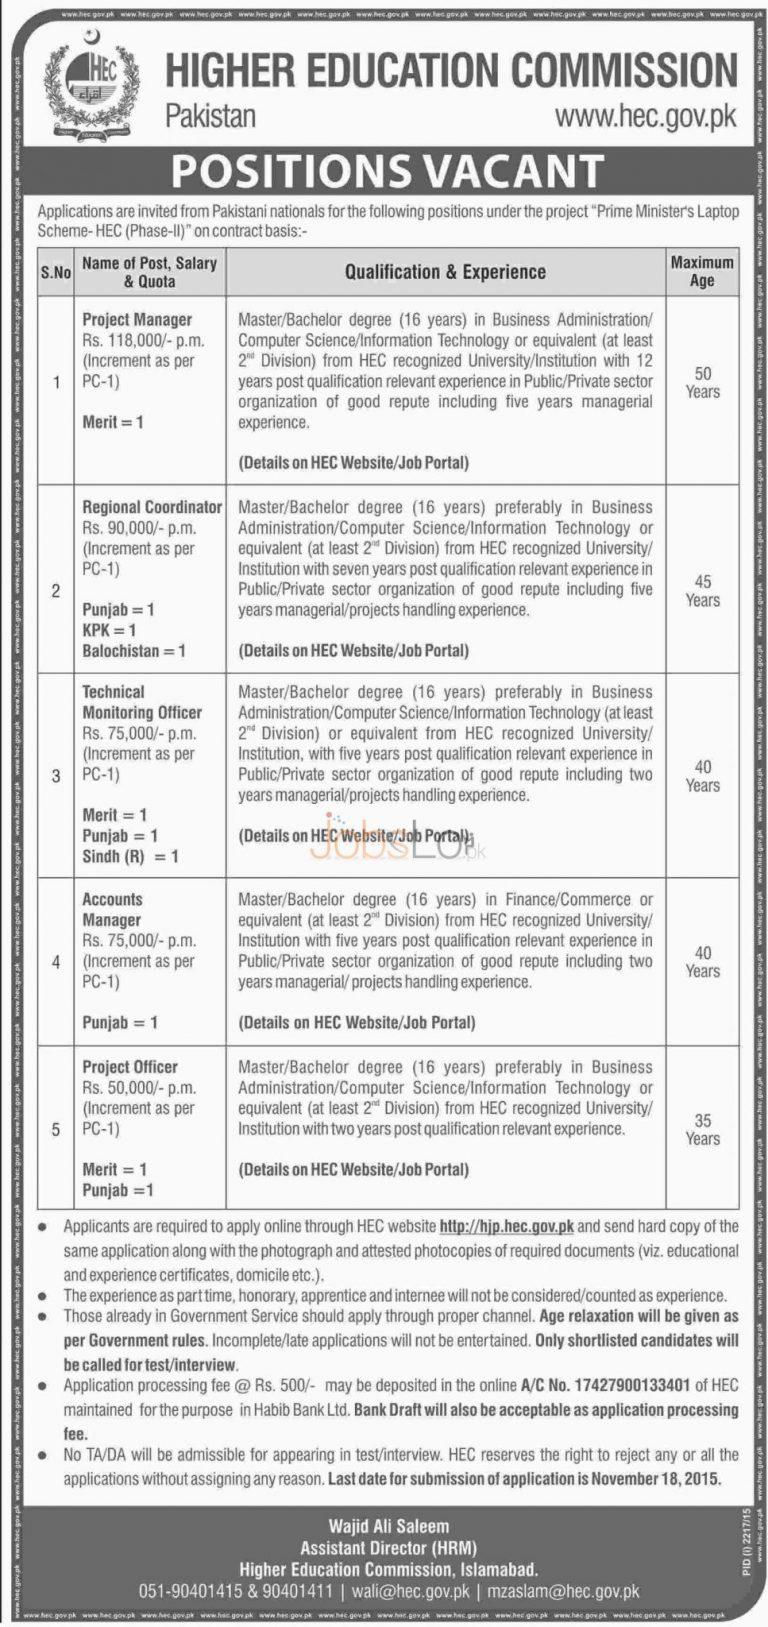 Higher Education Commission HEC Jobs November 2015 Apply Online